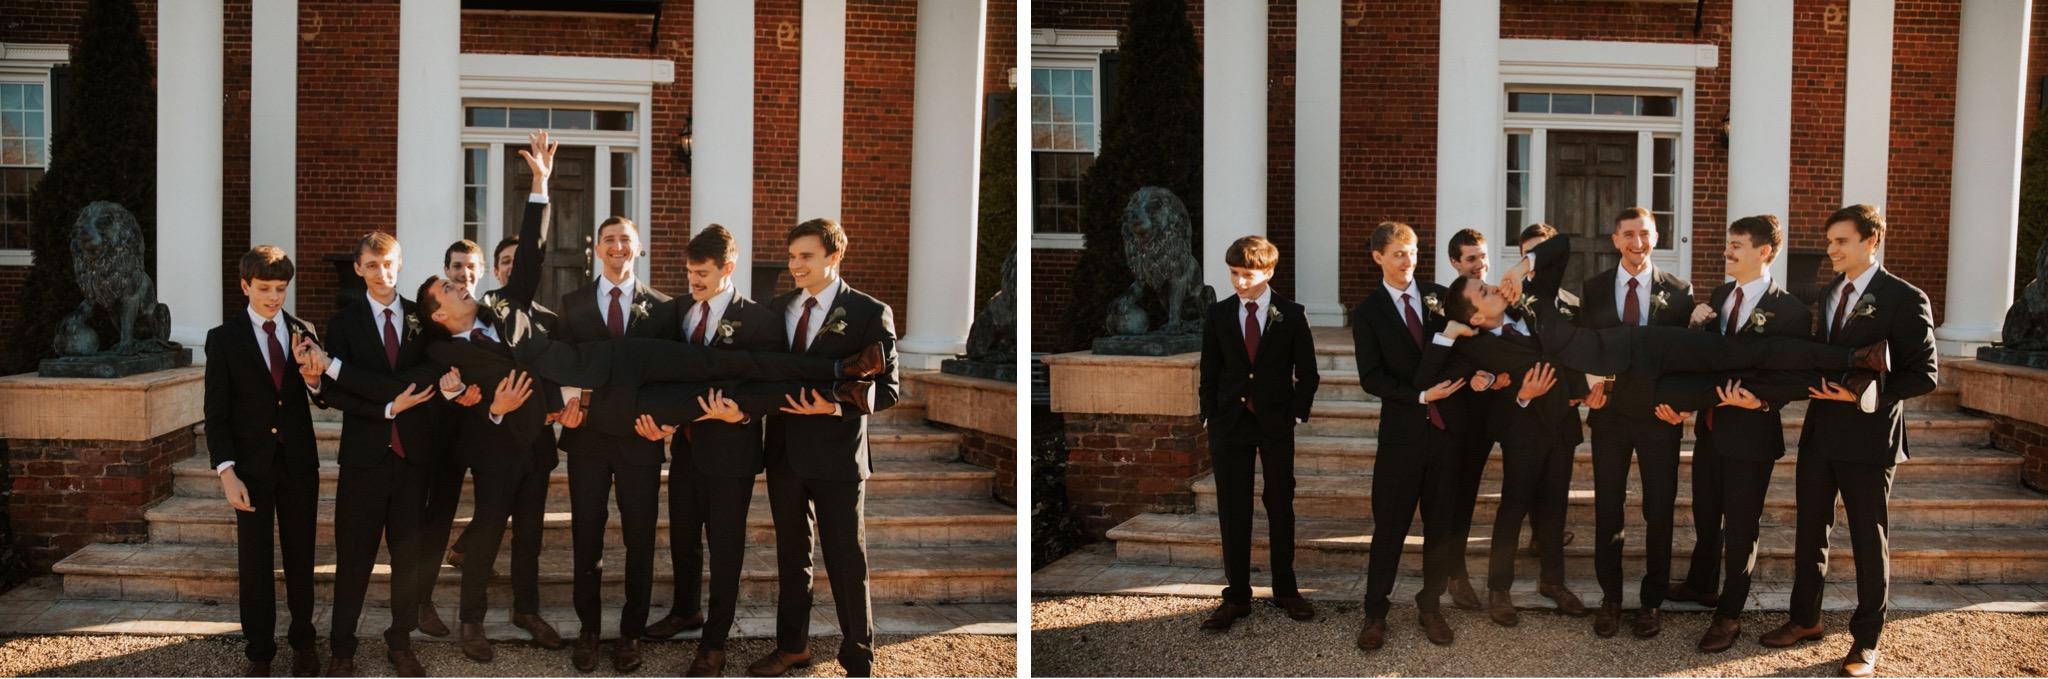 55_West Manor Estate Weddings - Pat Cori Photography-114_West Manor Estate Weddings - Pat Cori Photography-115_groomsmen_VirginiaWeddingPhotographer_WestManorEstate_Portraits_Wedding.jpg